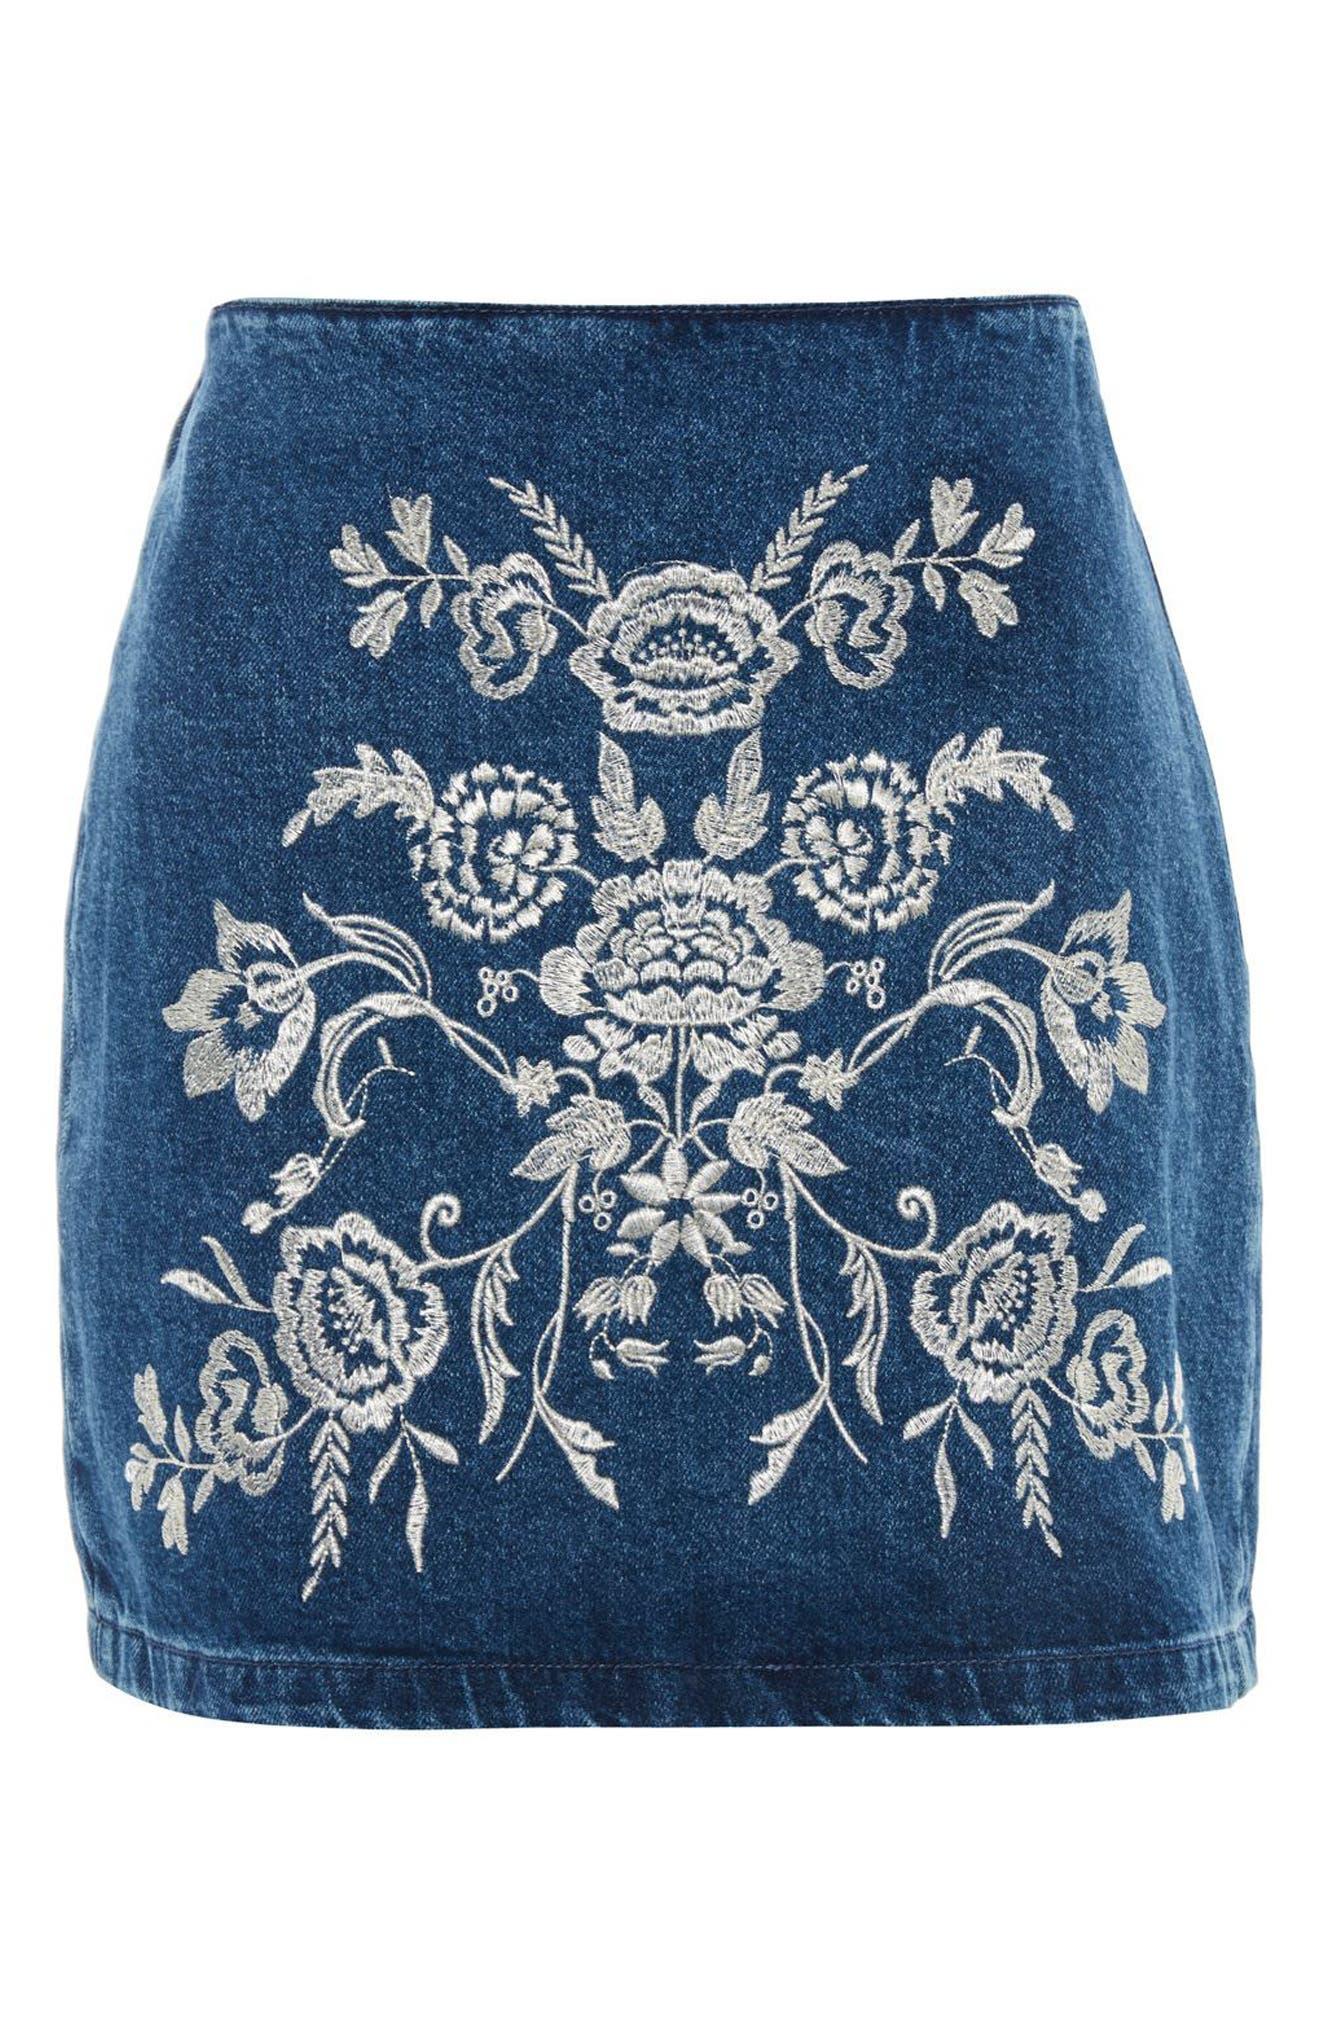 Floral Embroidered A-Line Skirt,                             Alternate thumbnail 4, color,                             Mid Denim